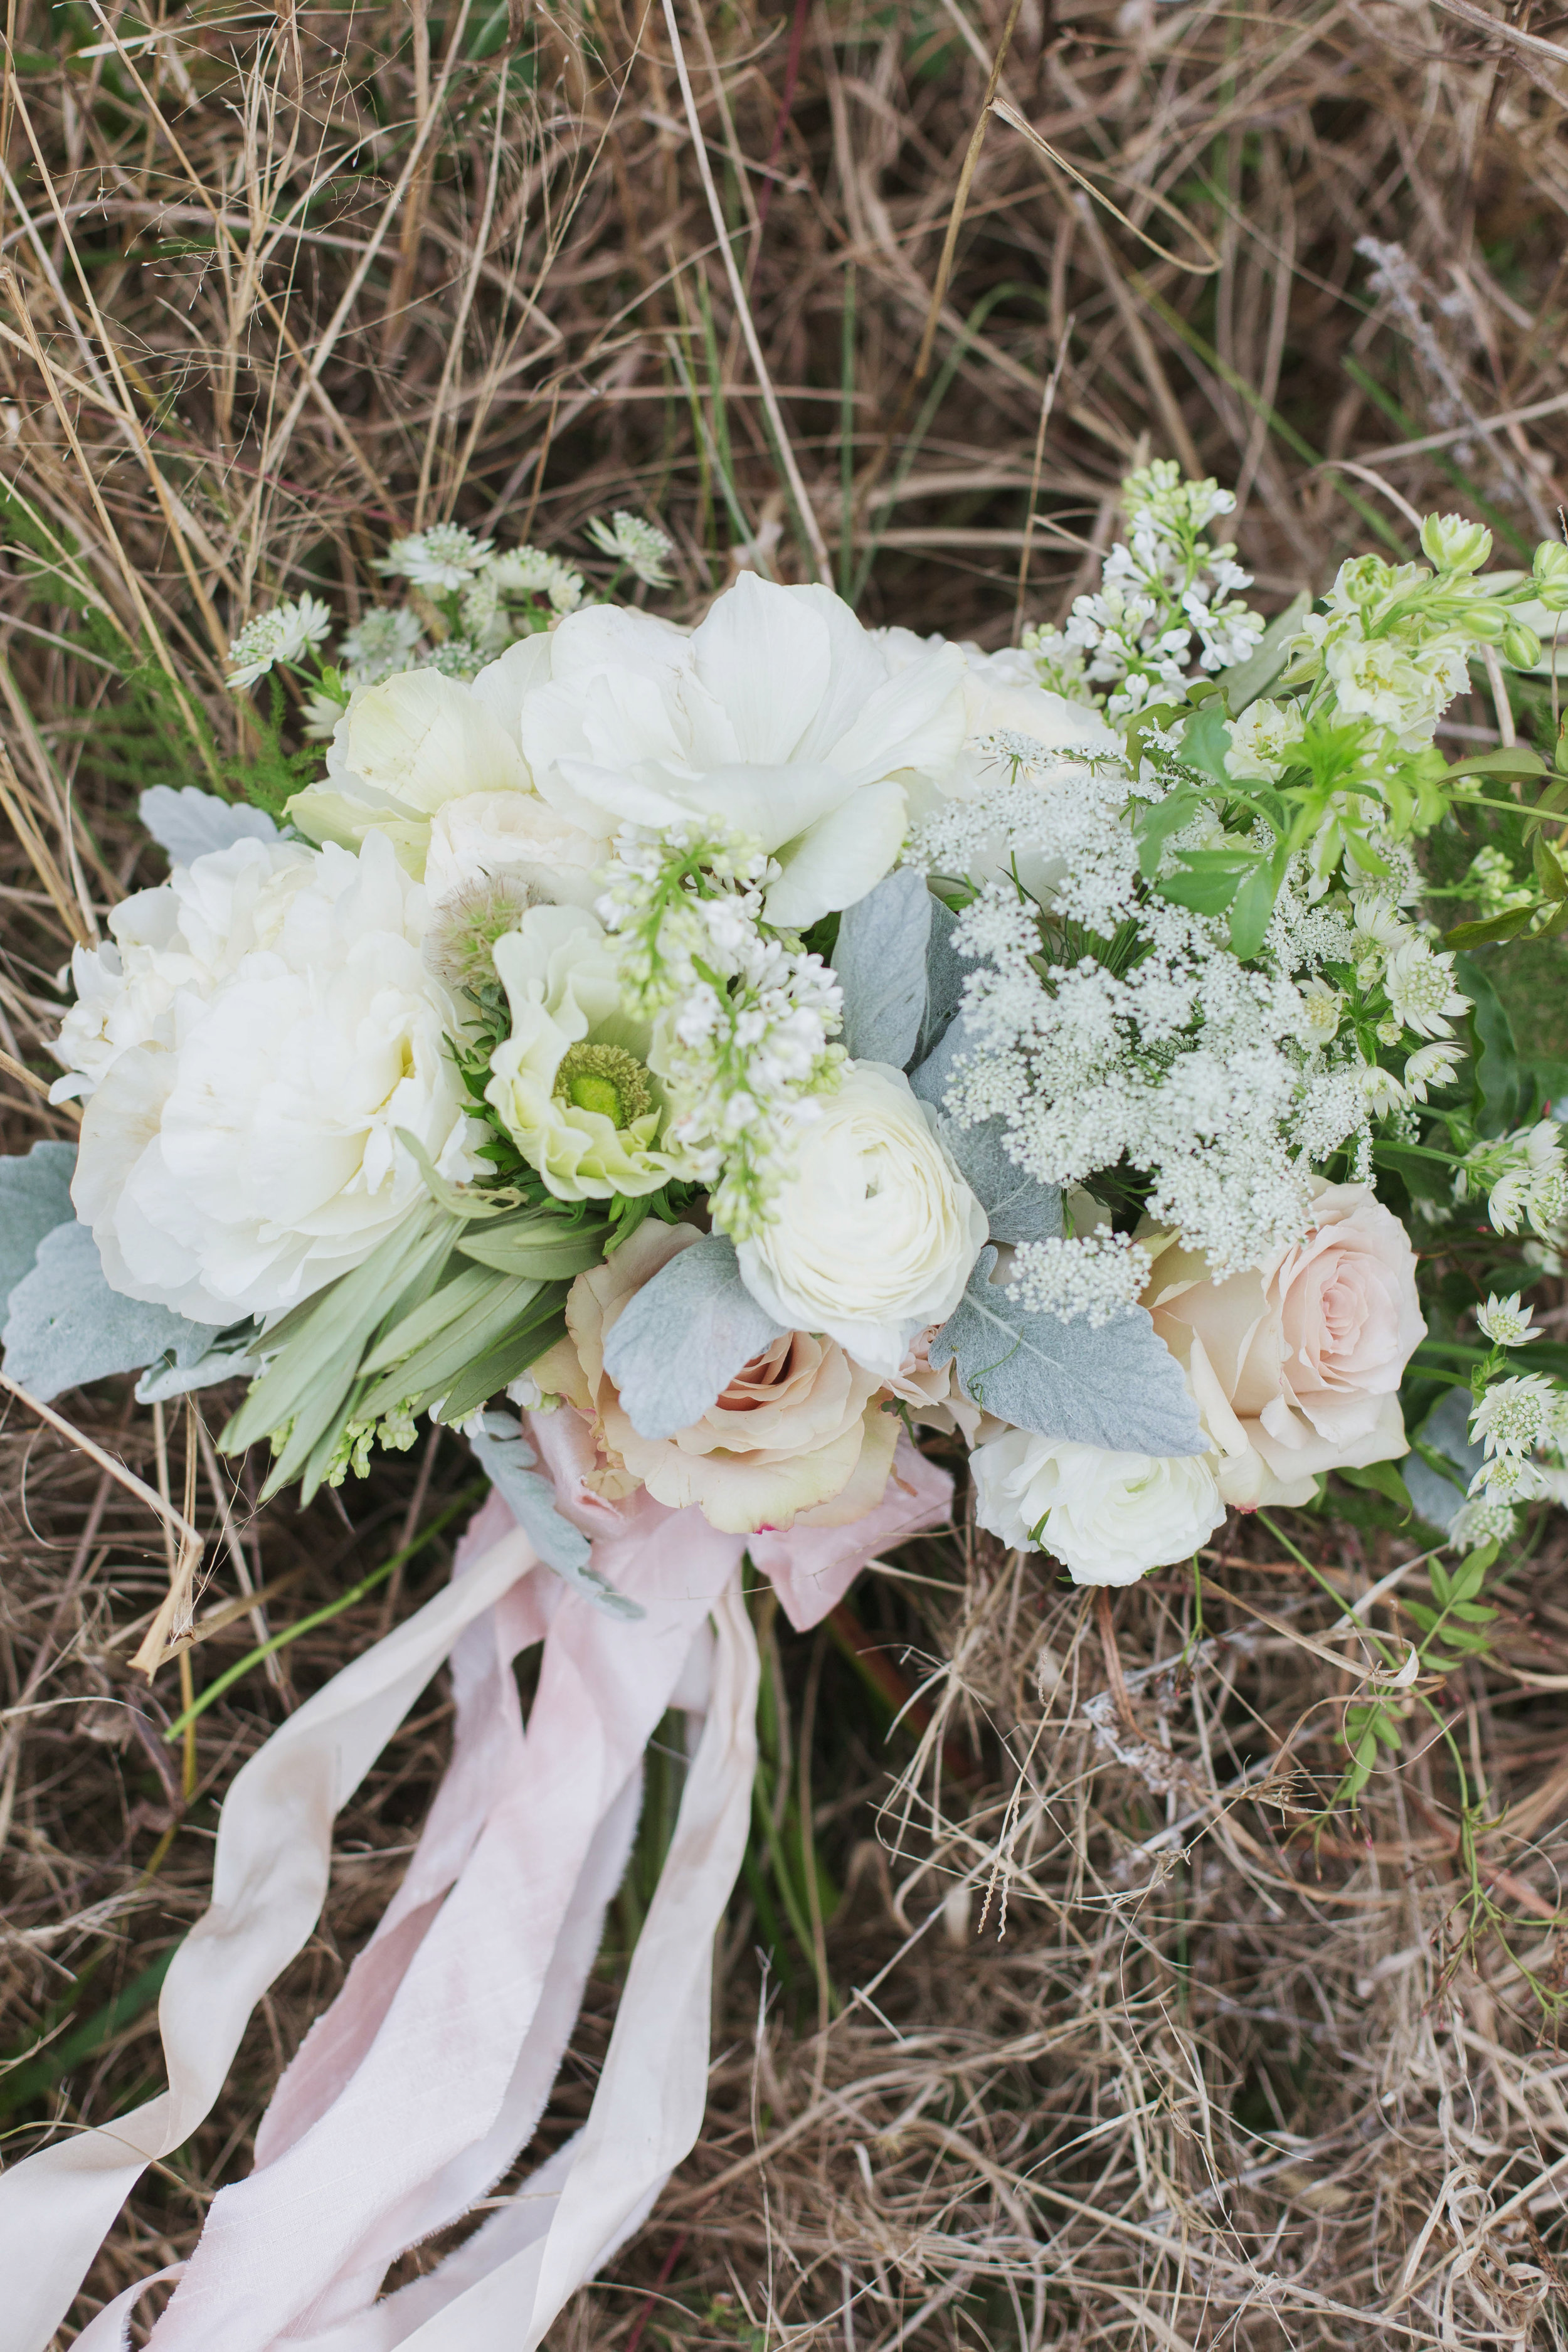 Simply-Charming-Socials_Atlanta-Wedding-Planner_Our-Labor-Of-Love_Emily-and-Jon_12.jpg